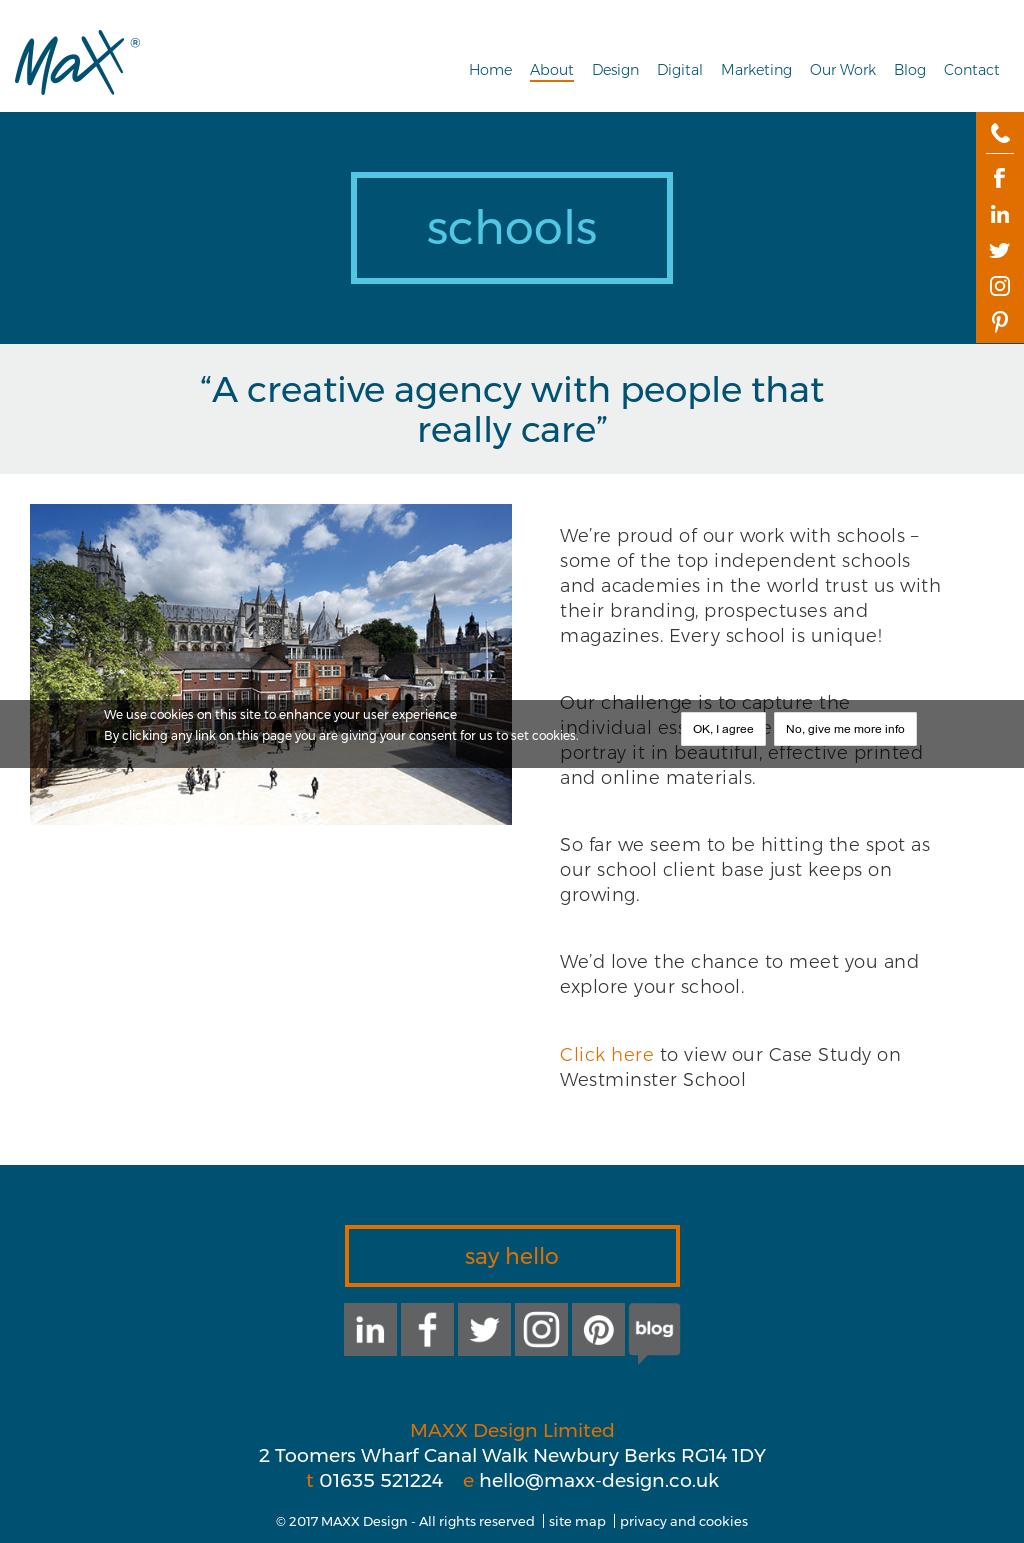 Maxx Schools Competitors, Revenue and Employees - Owler Company Profile